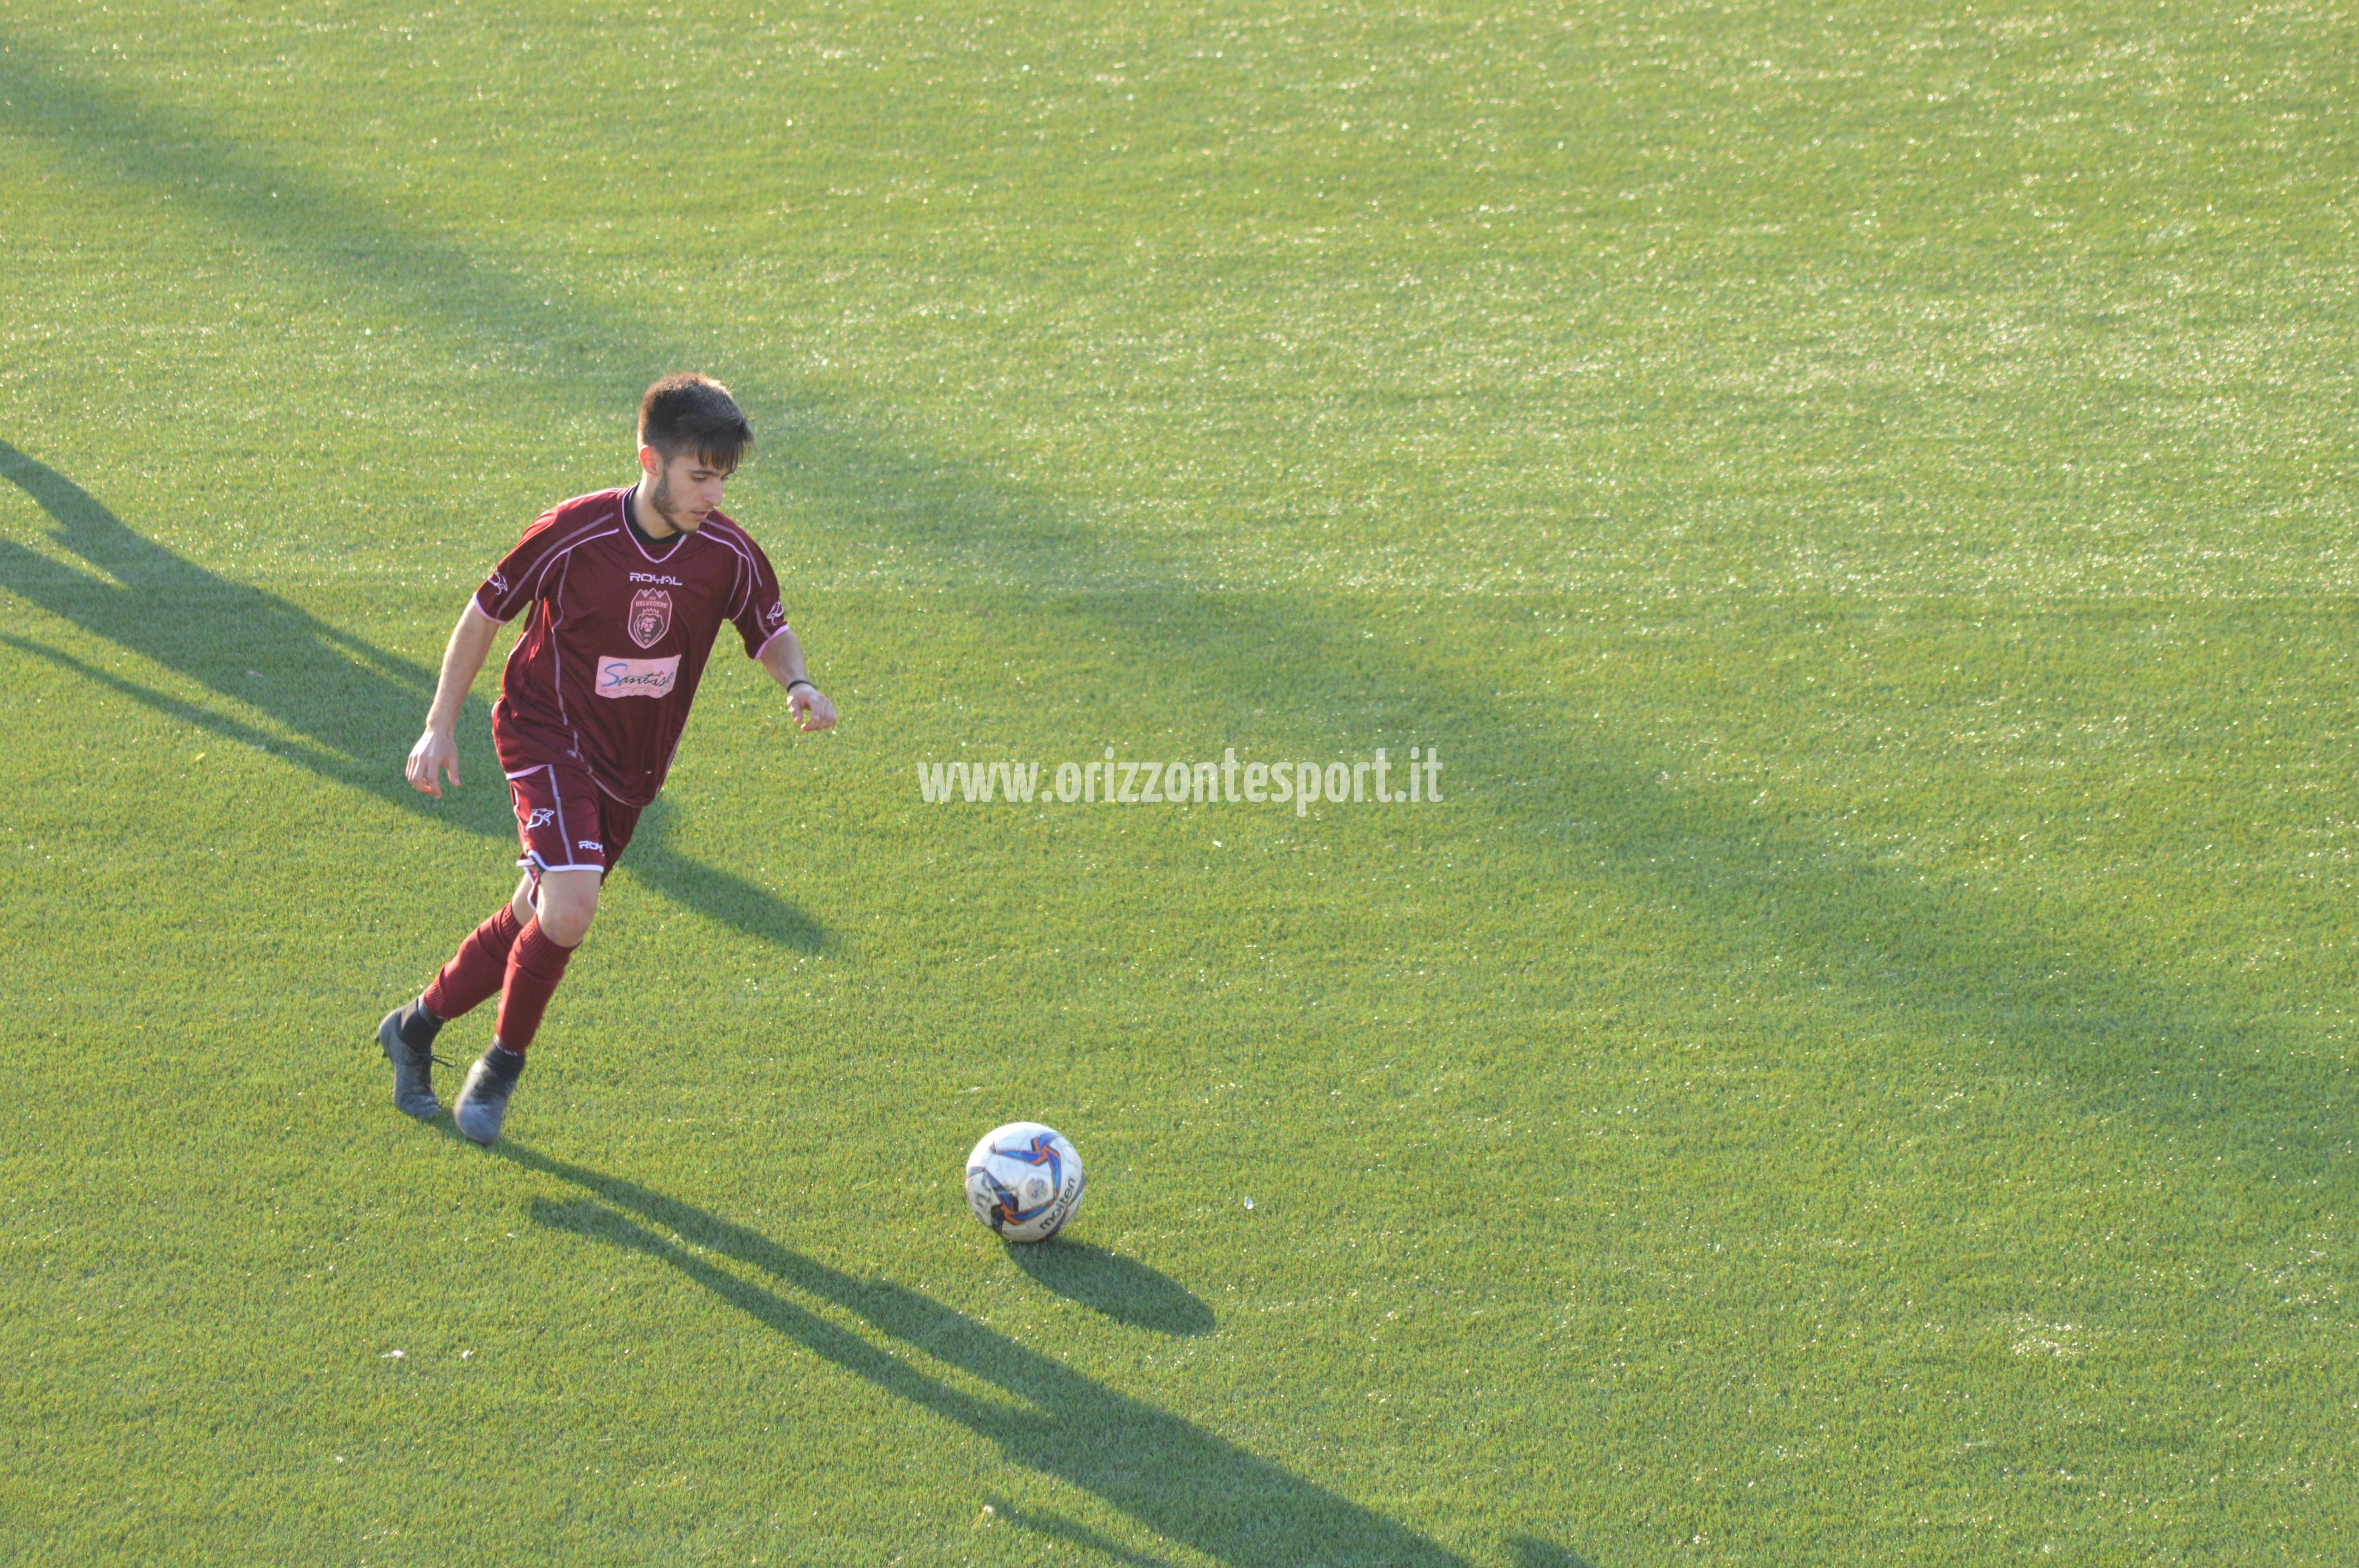 rossanese_belvedere (67)